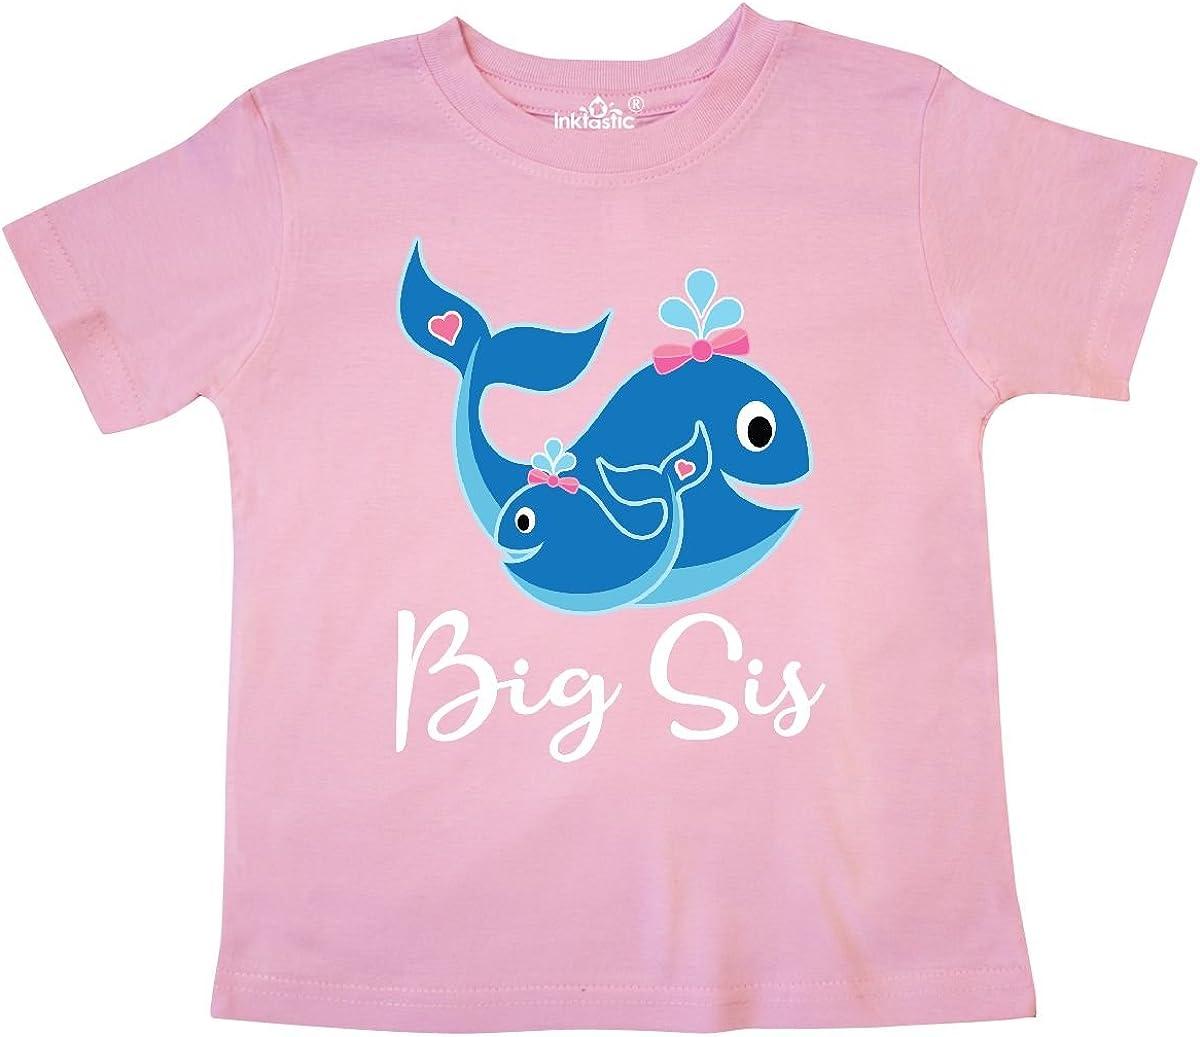 inktastic Big Sis Whale Girls Sister Toddler T-Shirt